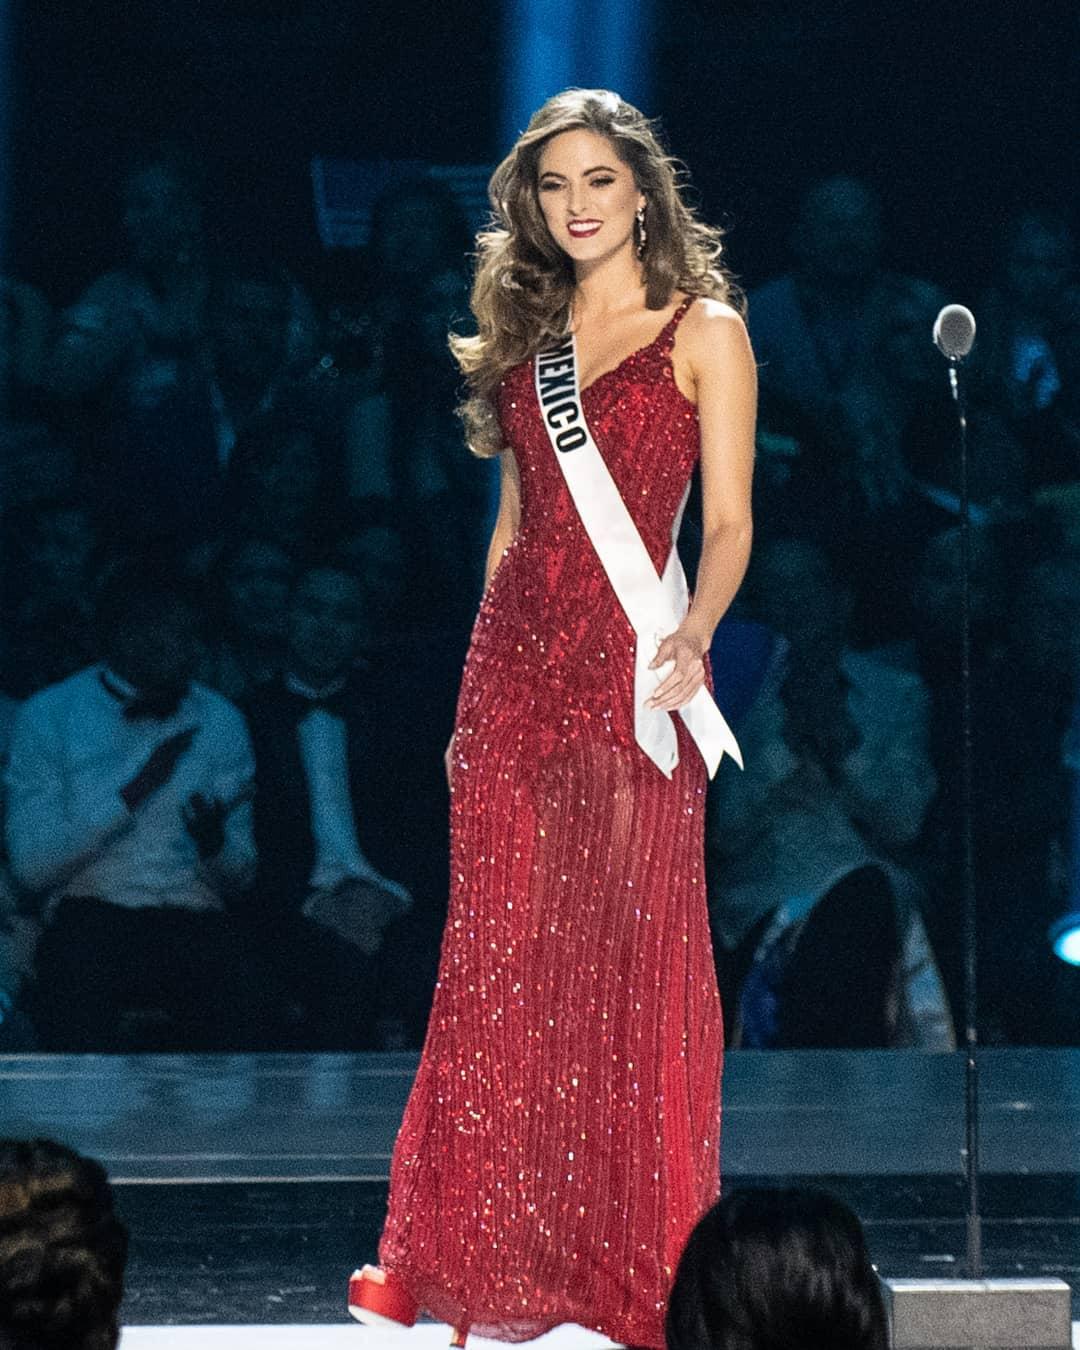 sofia aragon, 2nd runner-up de miss universe 2019. - Página 16 71784510